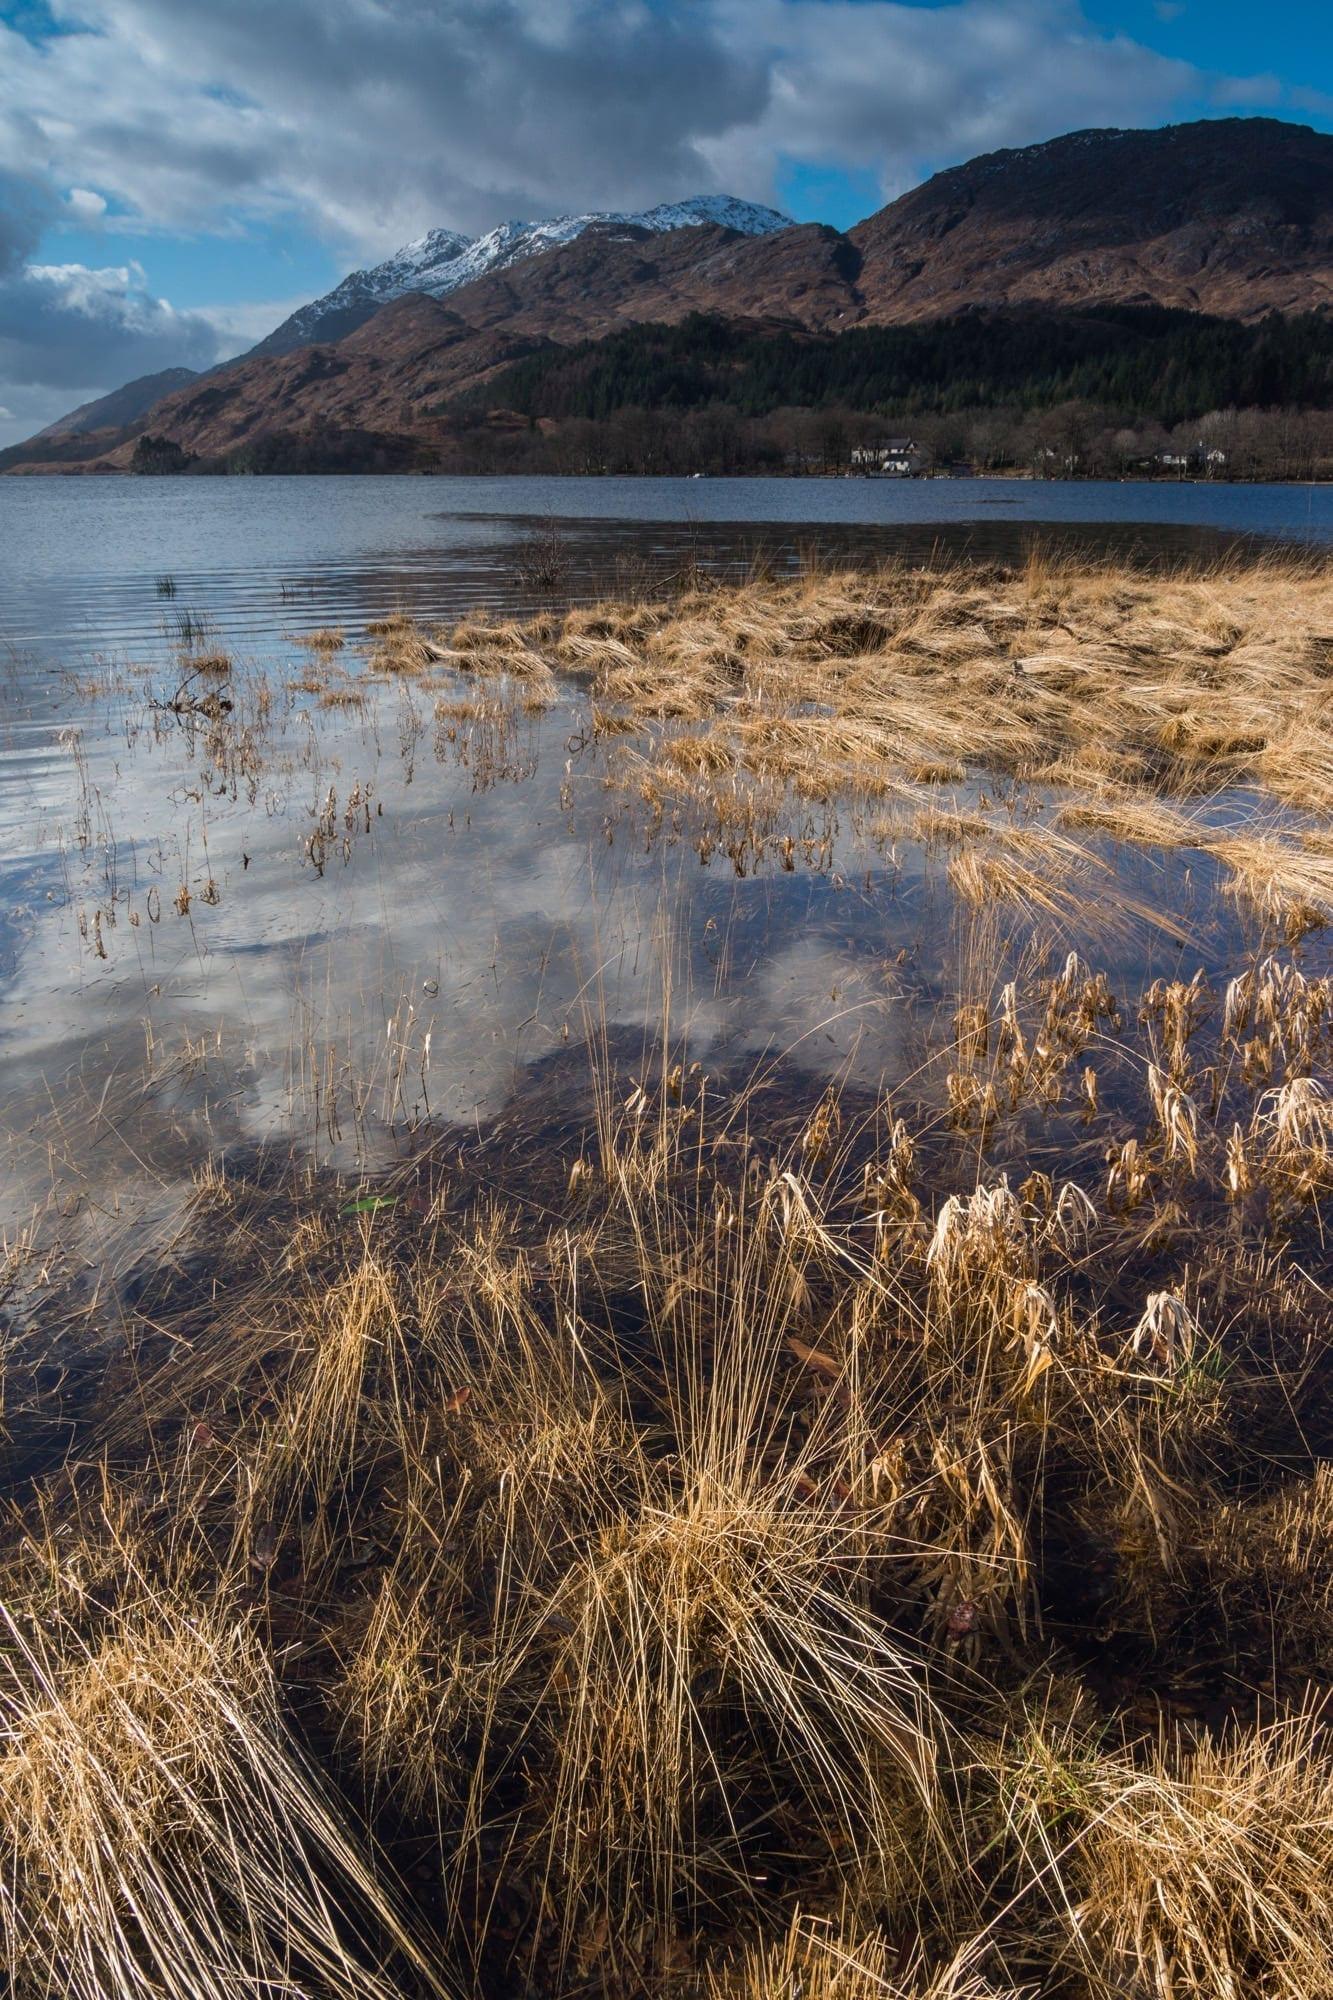 Glenfinnan and Loch Sheil - Scotland Photography